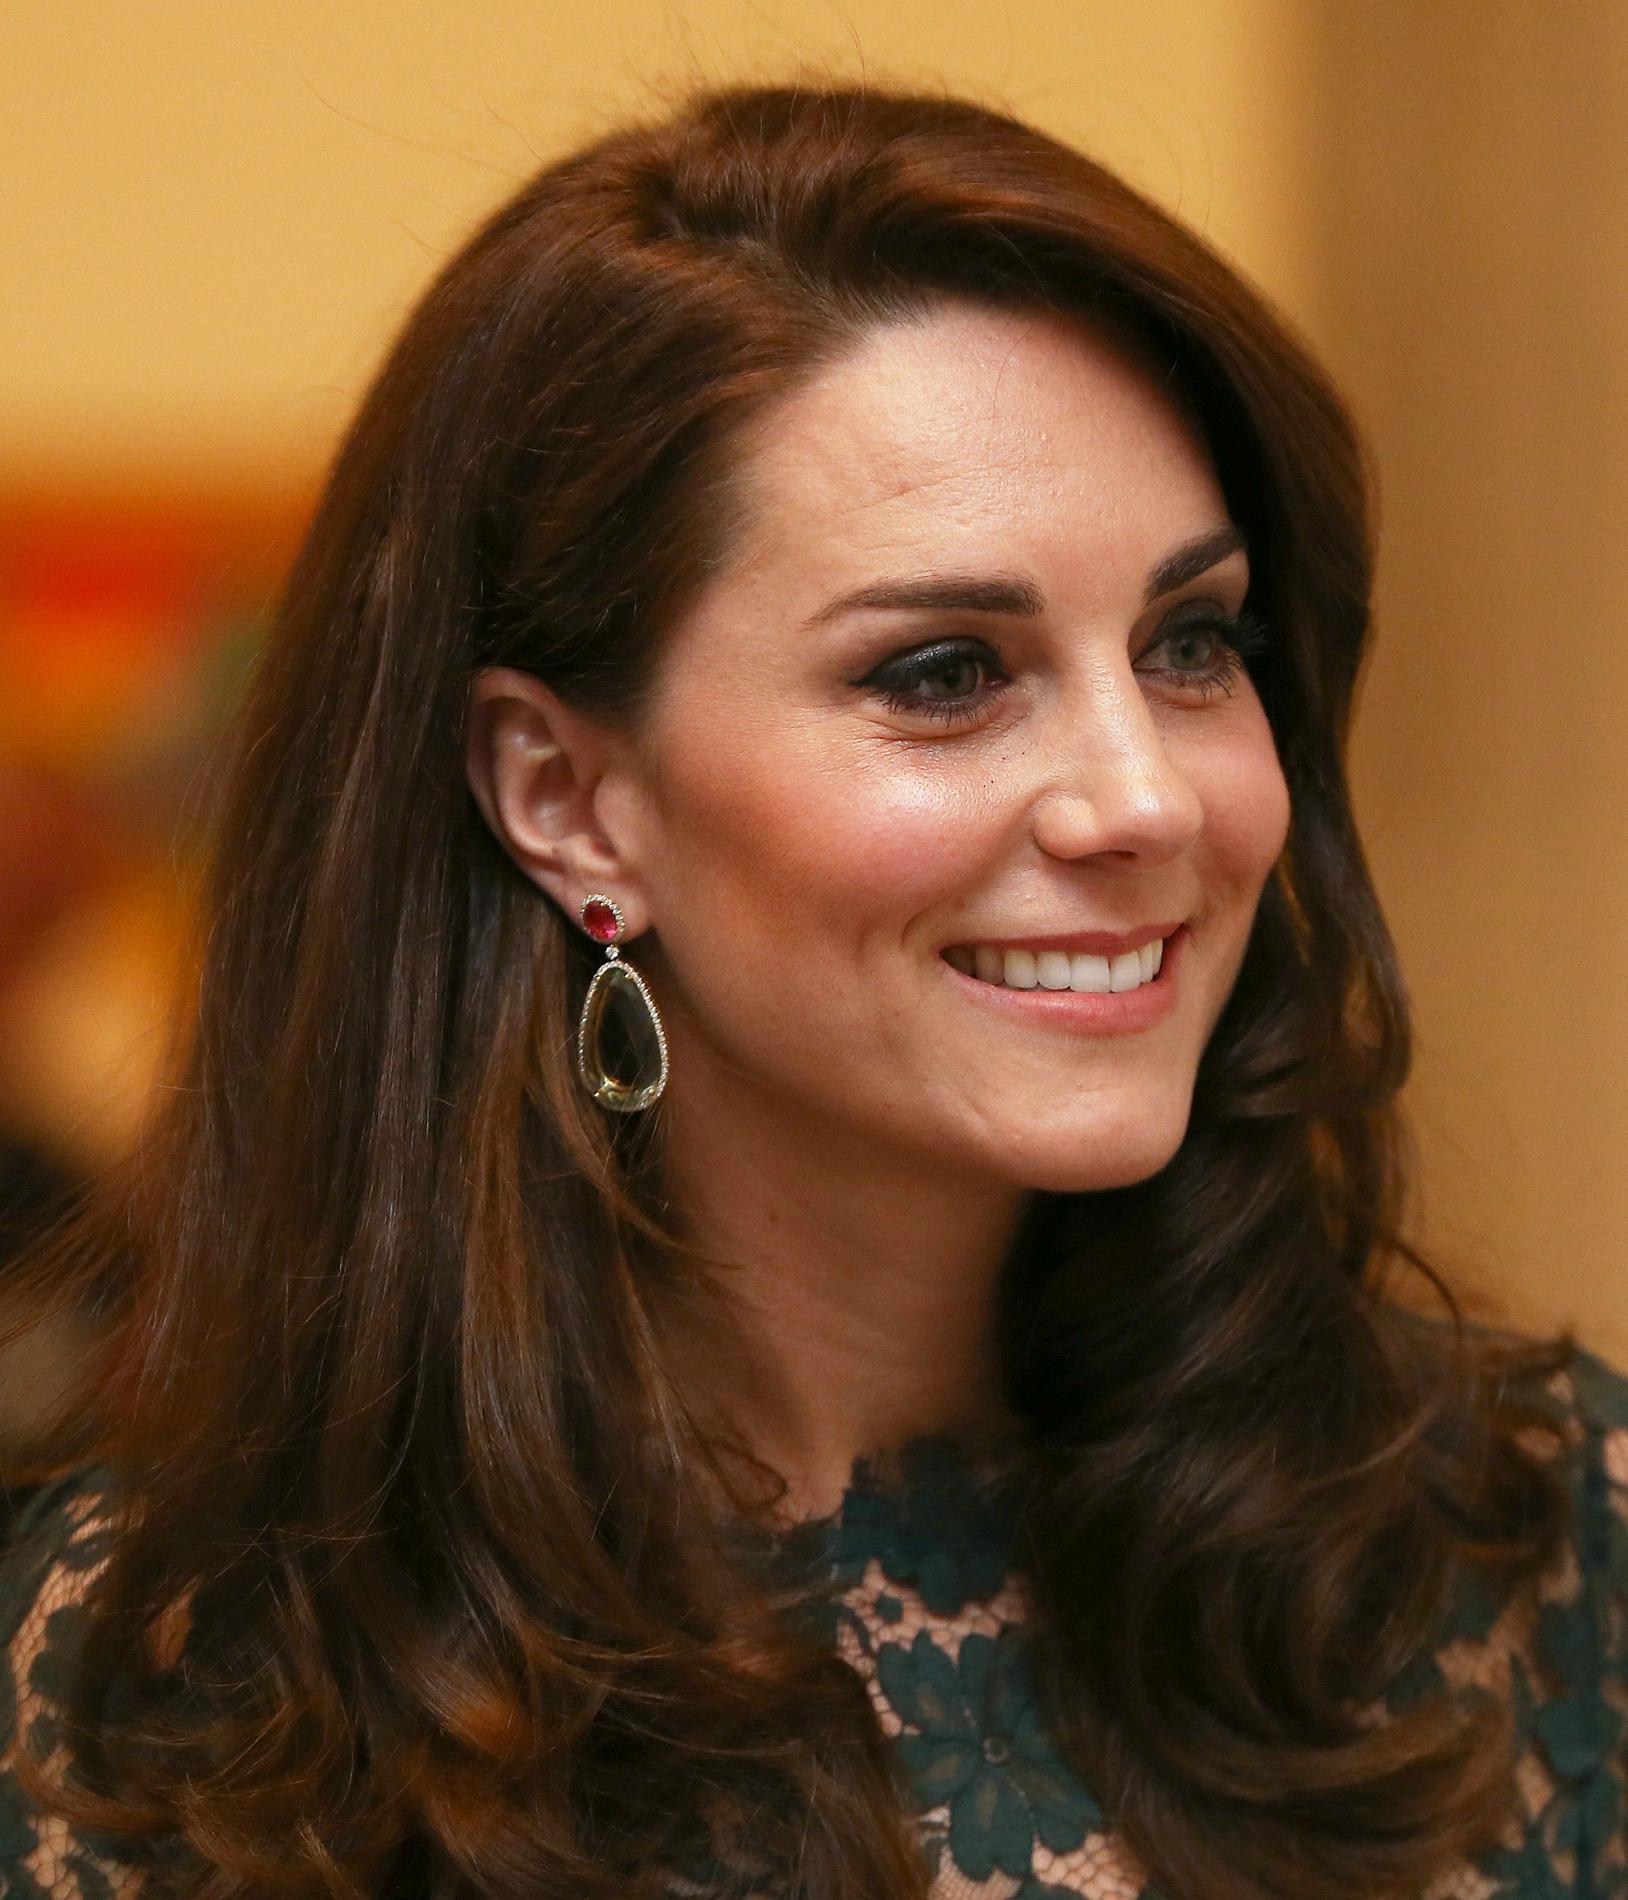 Kate Middleton adopte une nouvelle coiffure pour lu0026#39;u00e9tu00e9 et nu0026#39;a pas hu00e9situ00e9 u00e0 couper - Madame Figaro